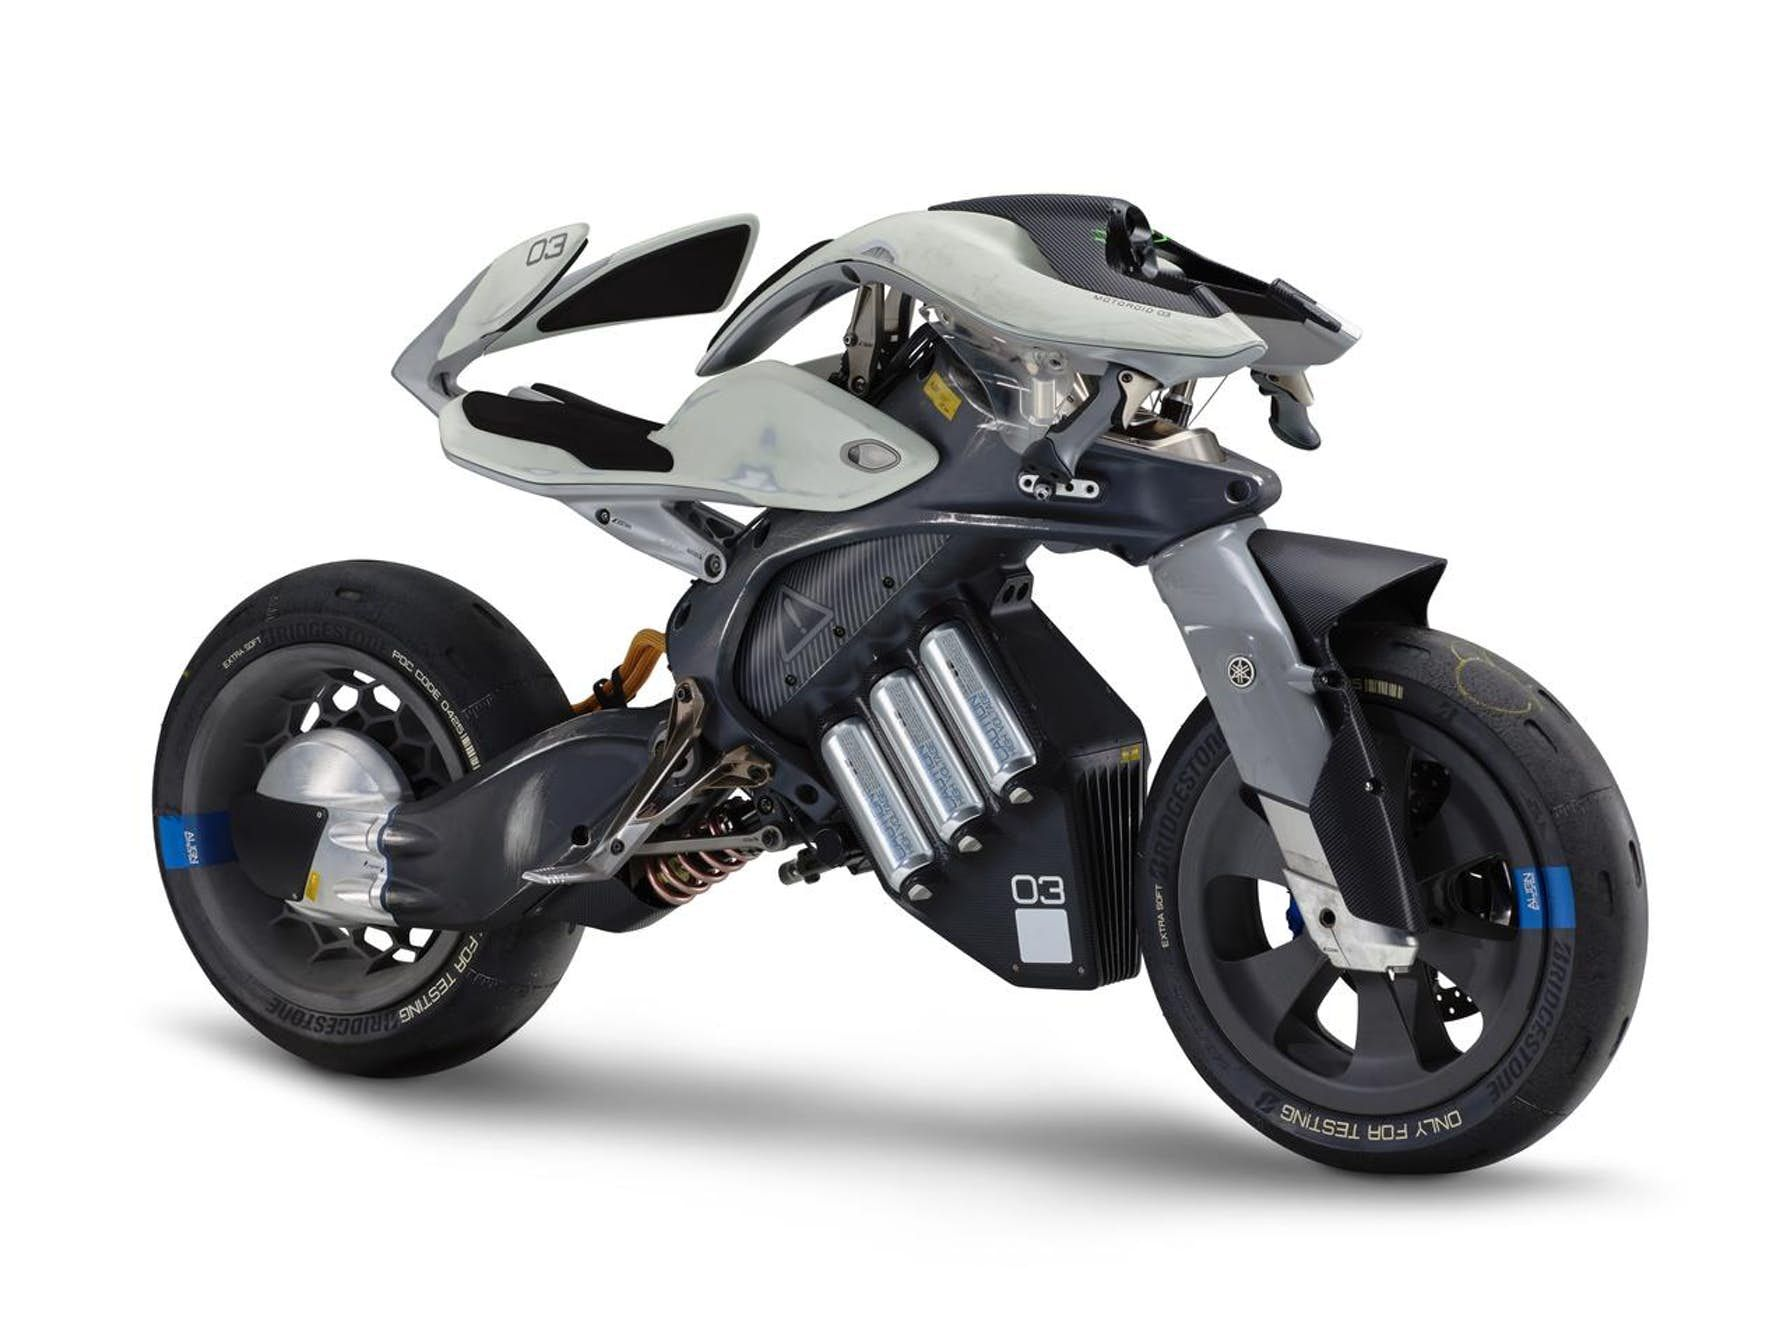 Yamaha Explores Fusing Artificial Intelligence And Motorcycles Electric Motorcycle Yamaha Bikes Futuristic Motorcycle